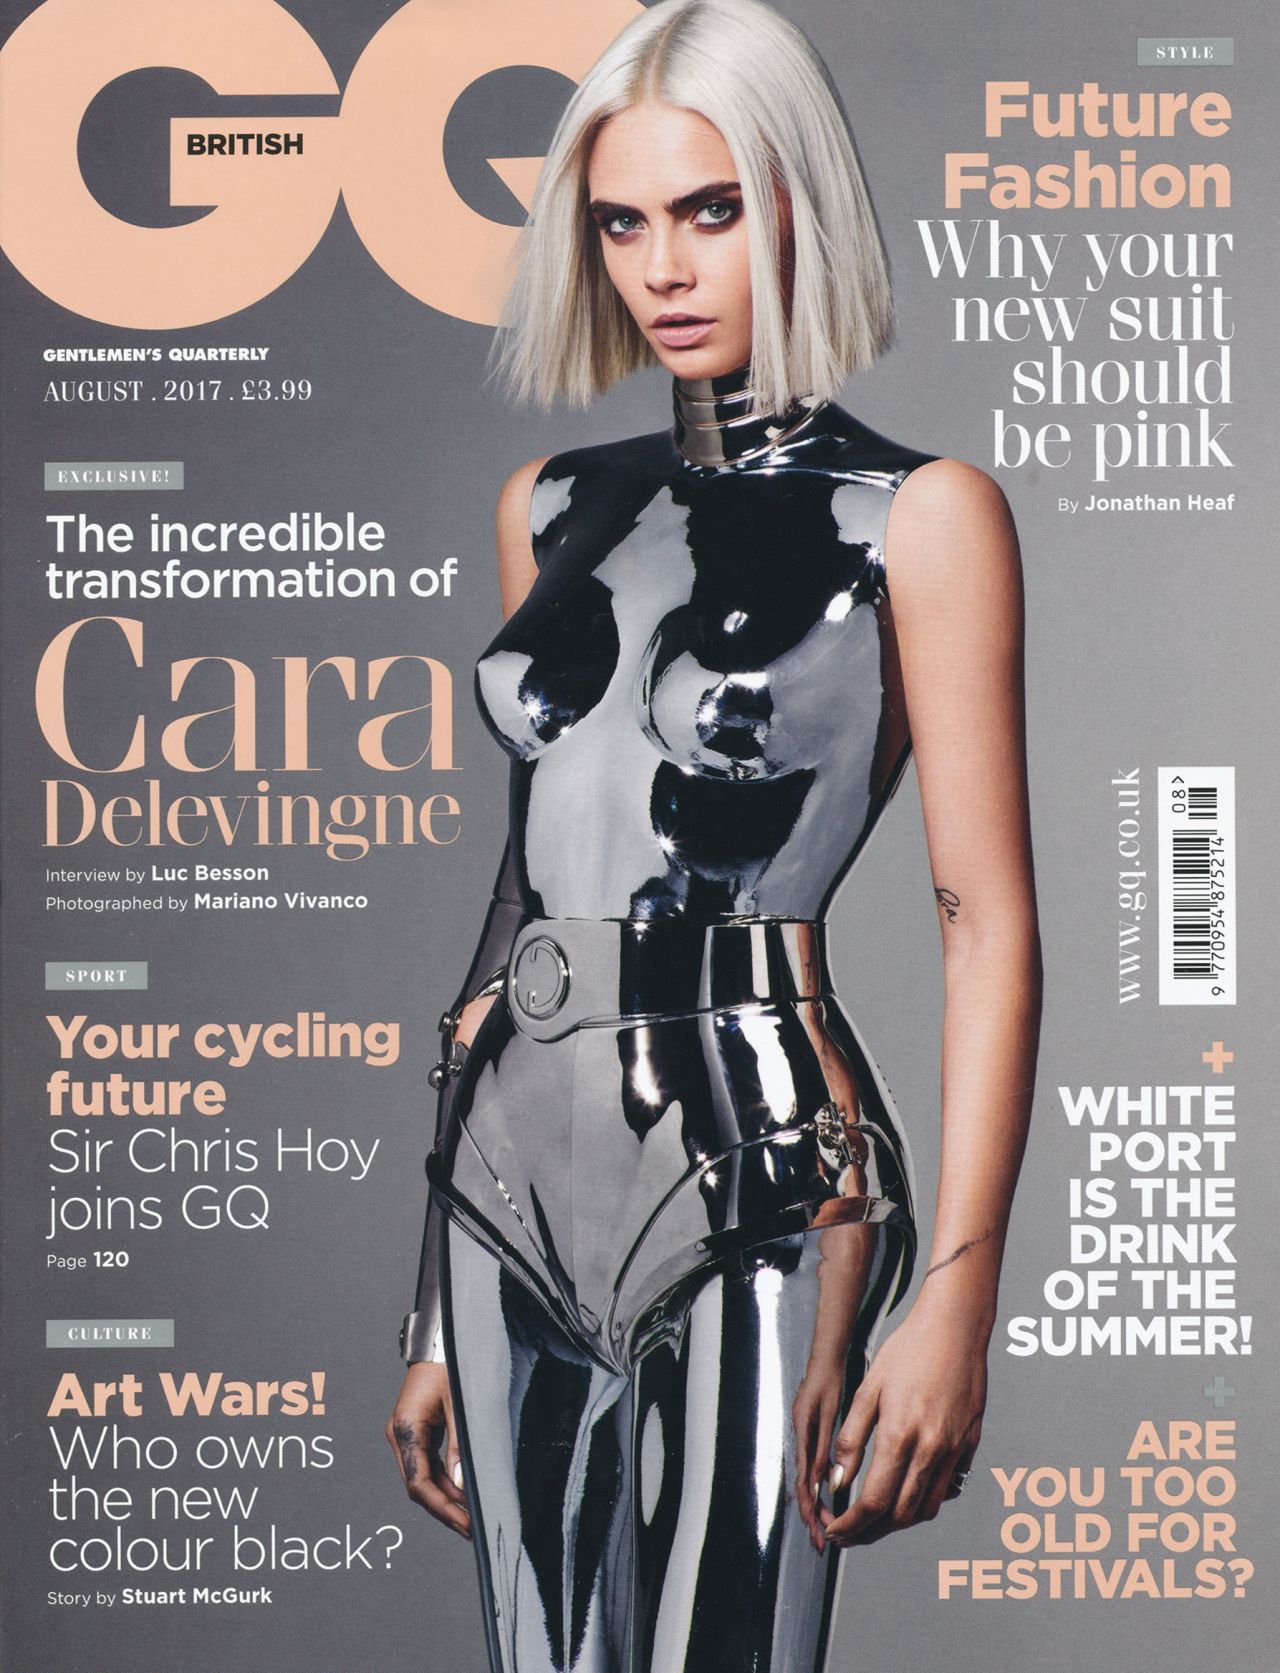 Beyonce GQ Cover: Singer Shows Major Skin On Magazine